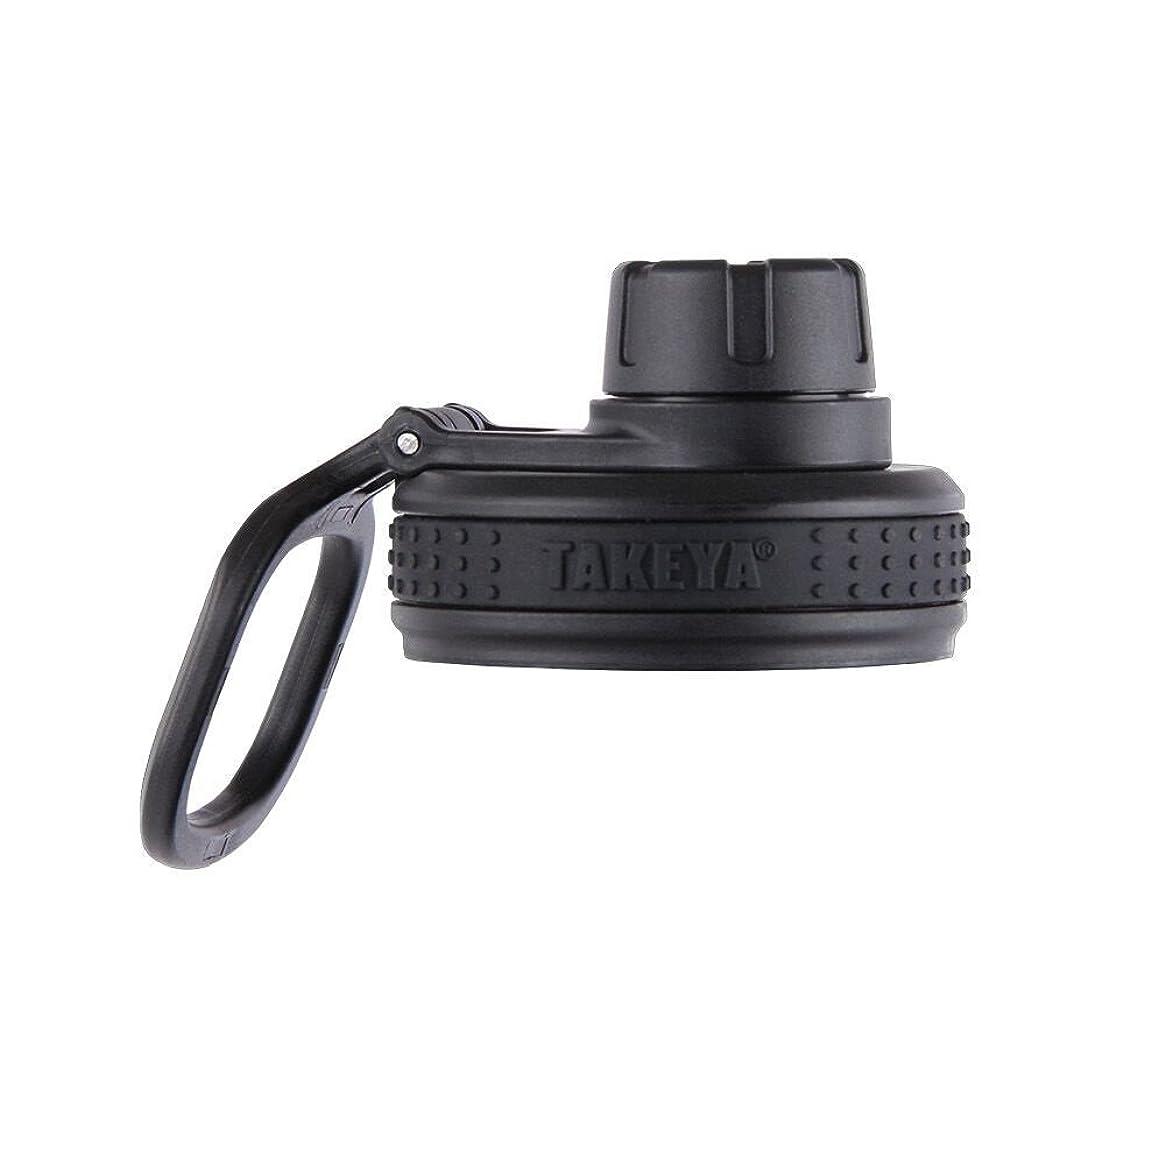 Takeya Originals Bottle Spout Lid, Black